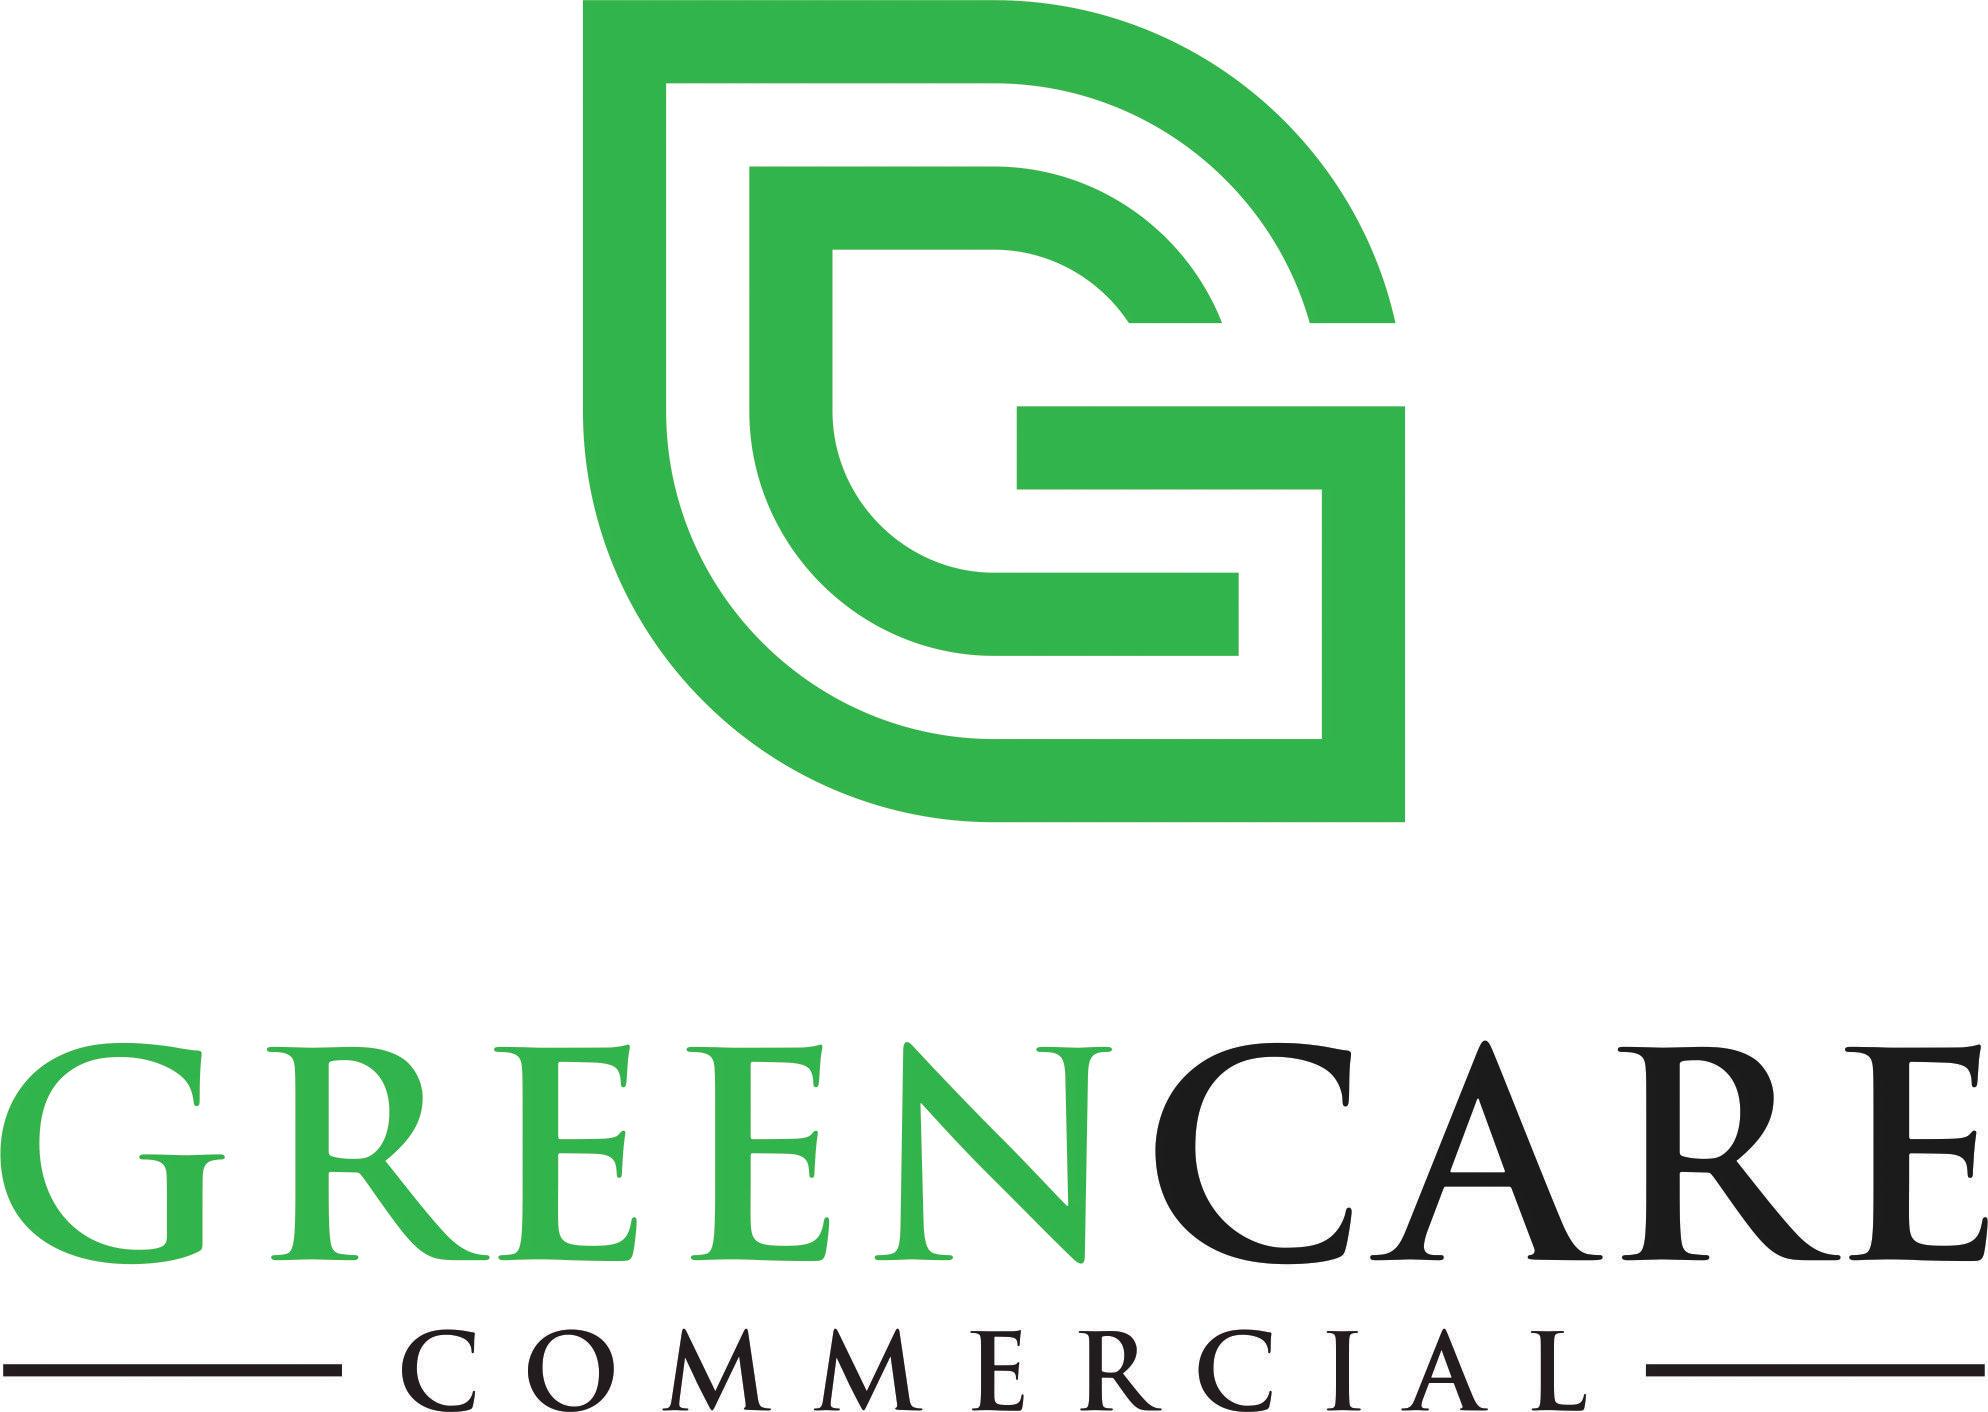 greecare commercial logo